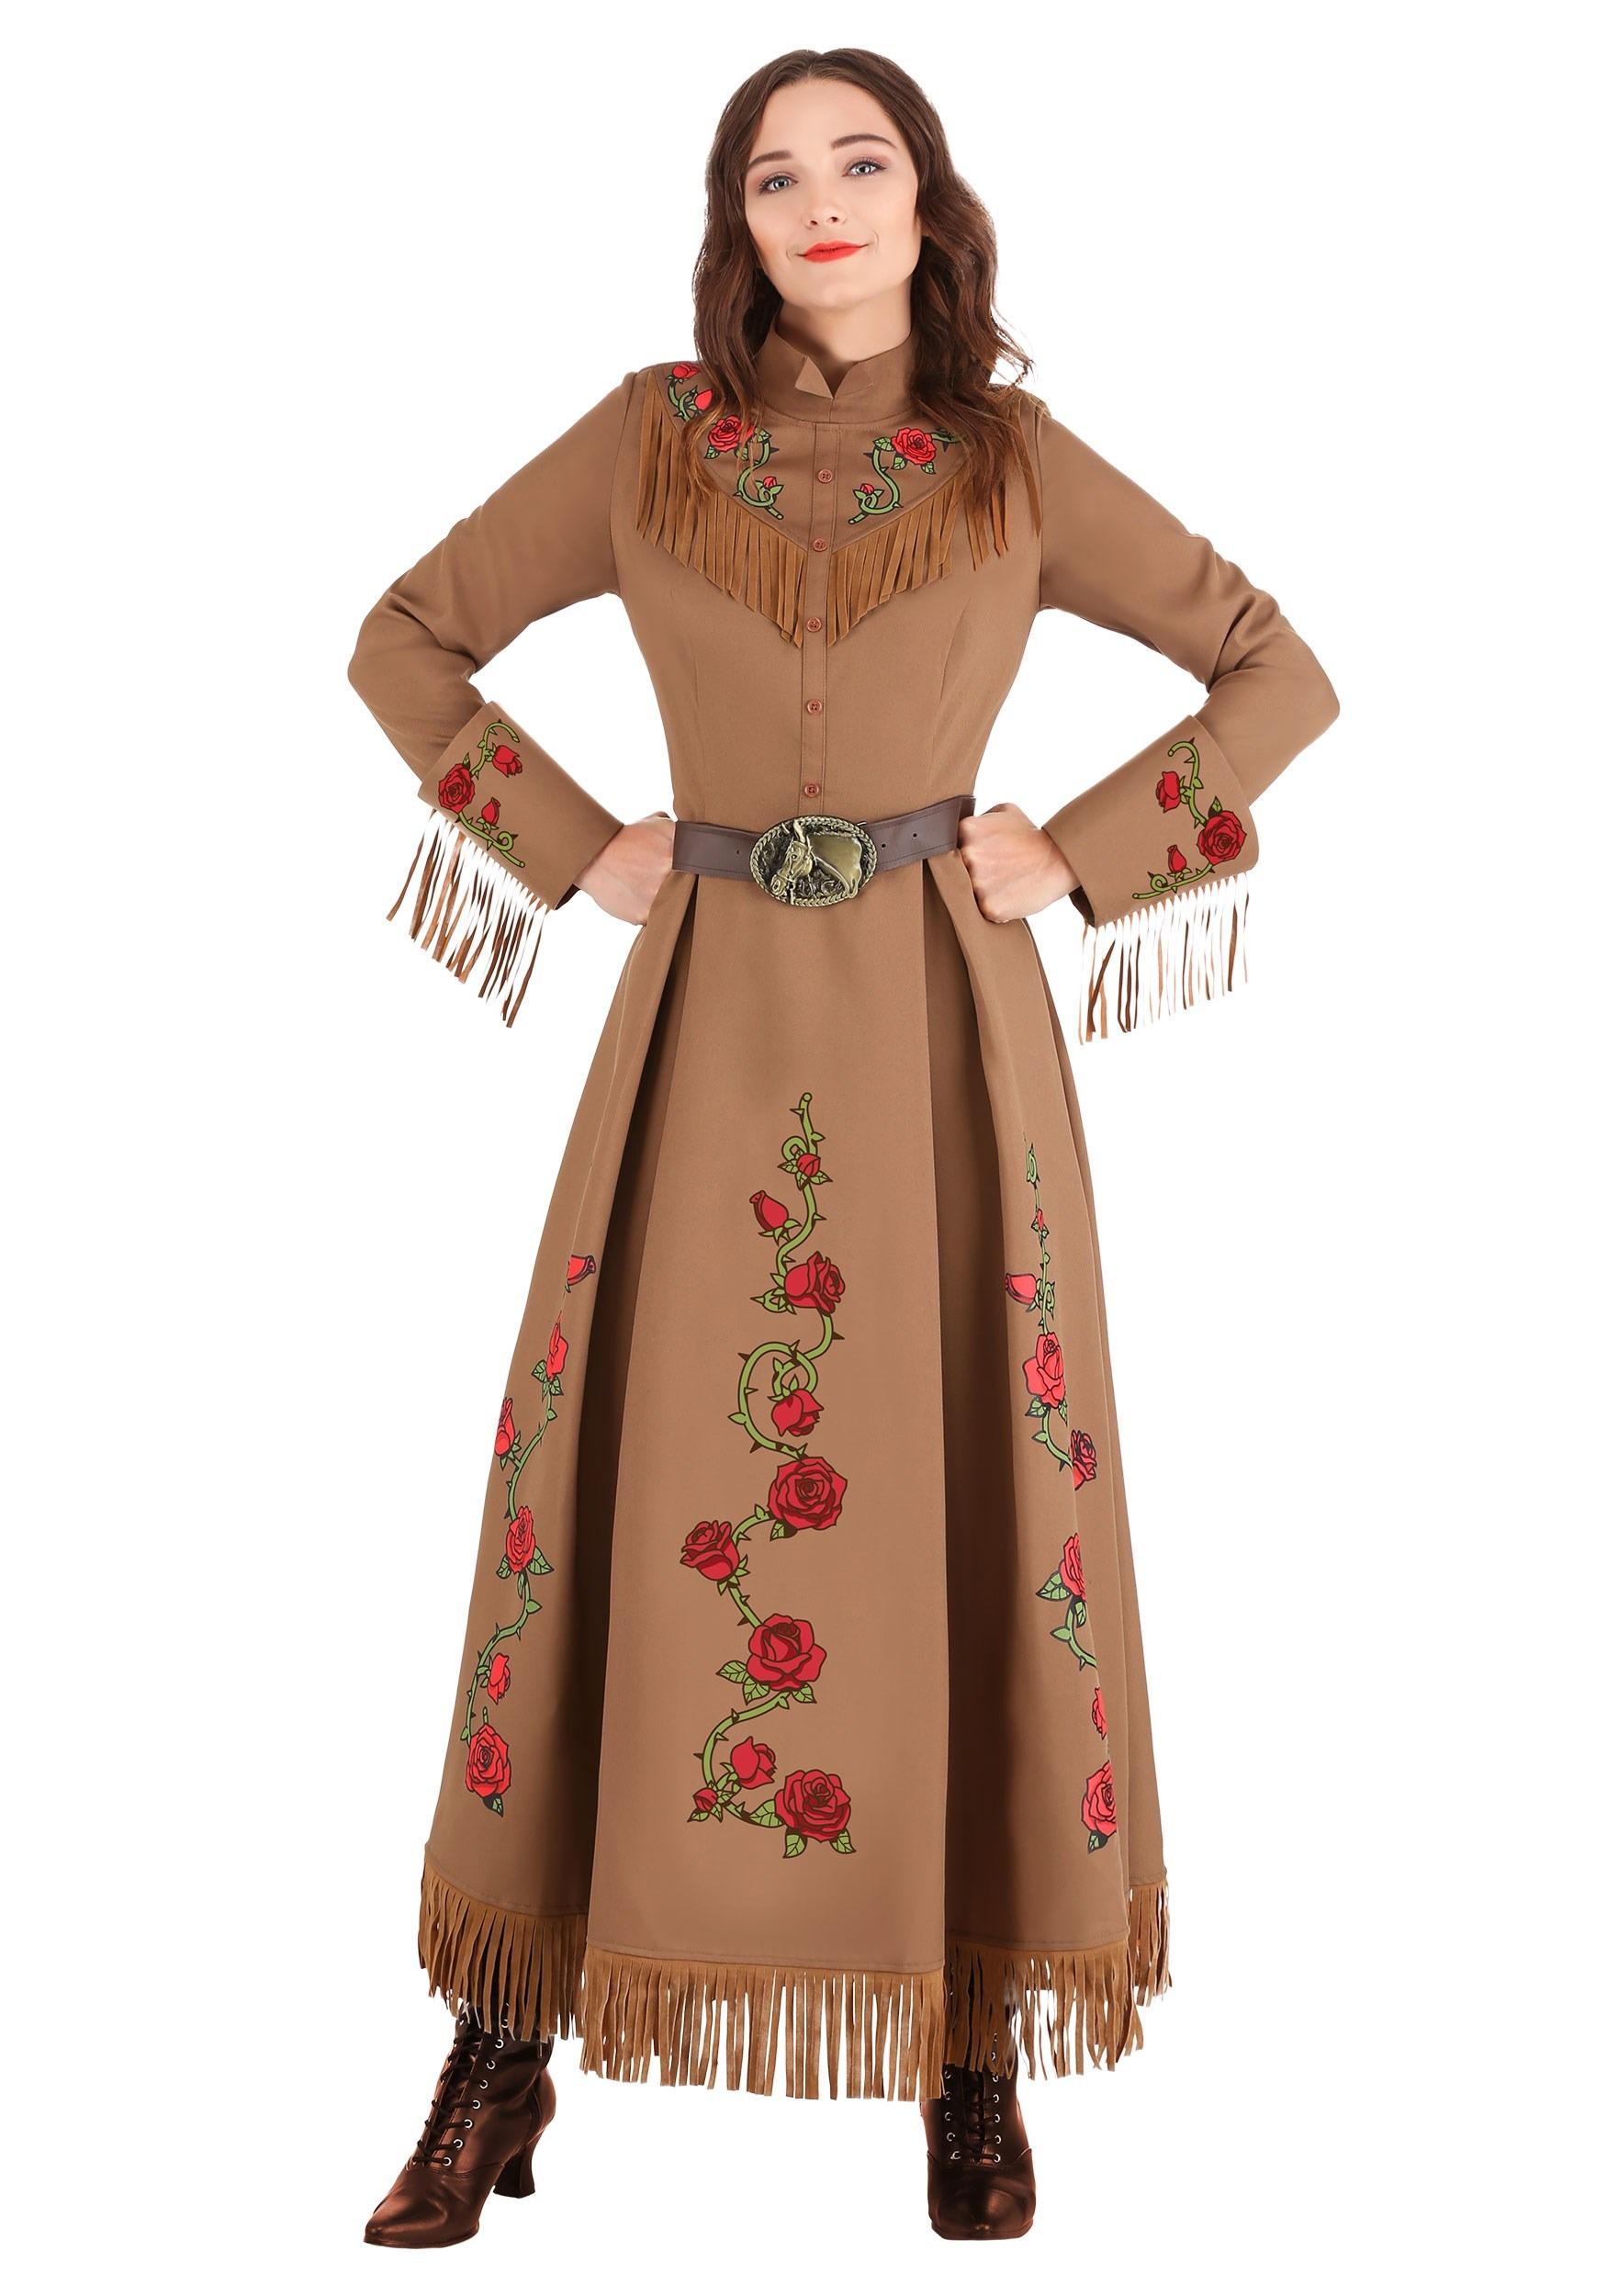 Annie Oakley Cowgirl Costume for Women